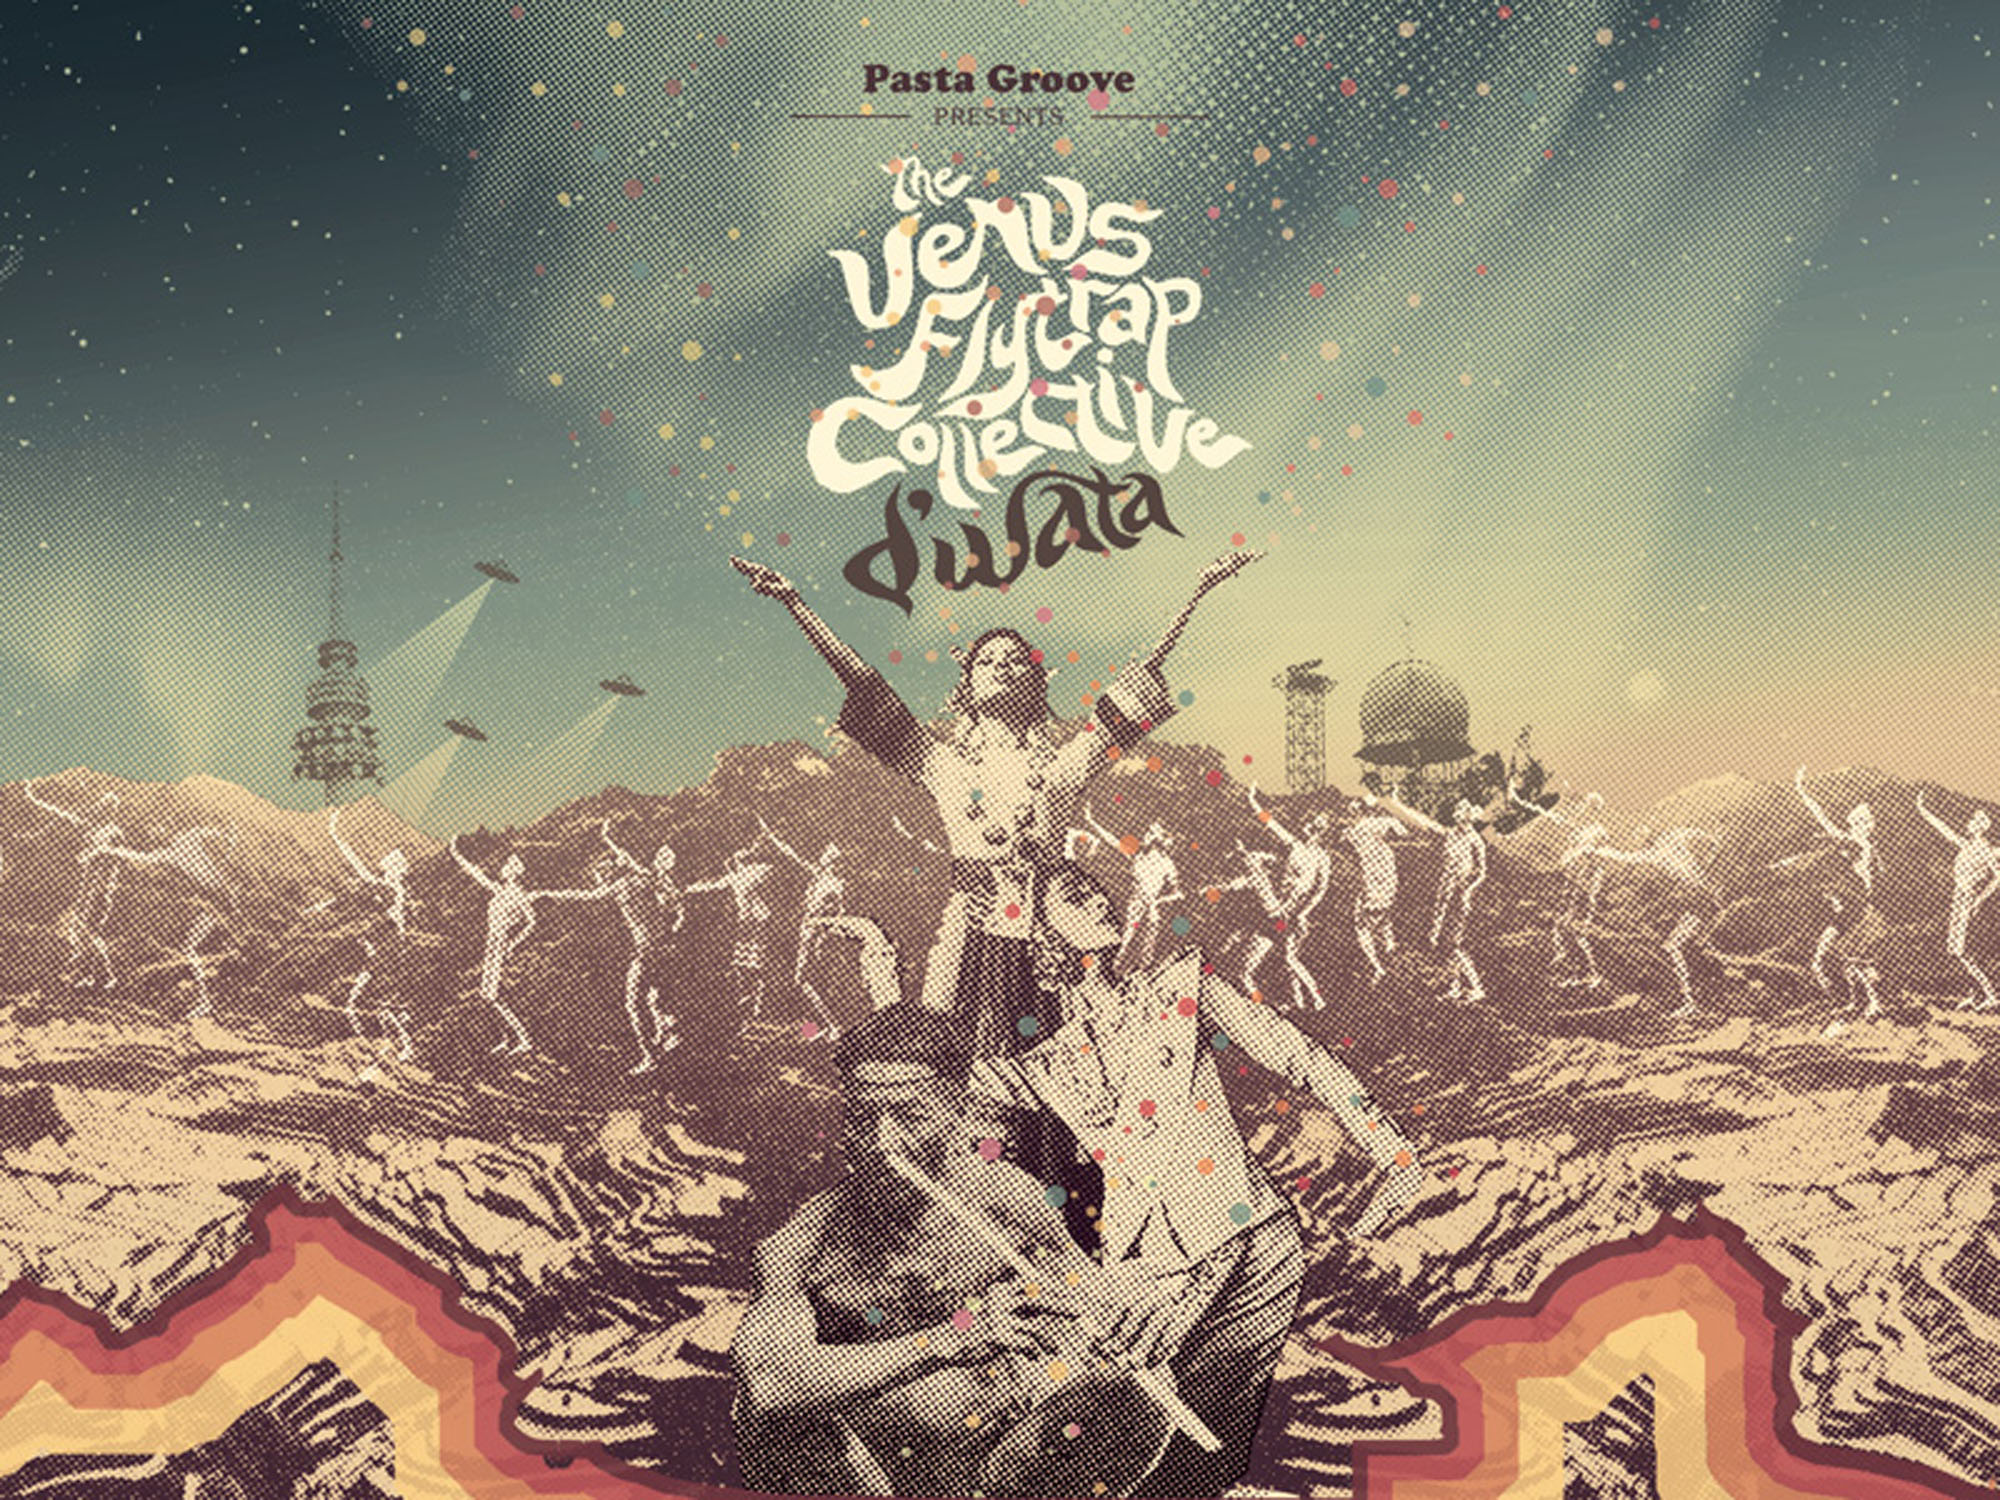 Venus Flytrap Collective: D'wata